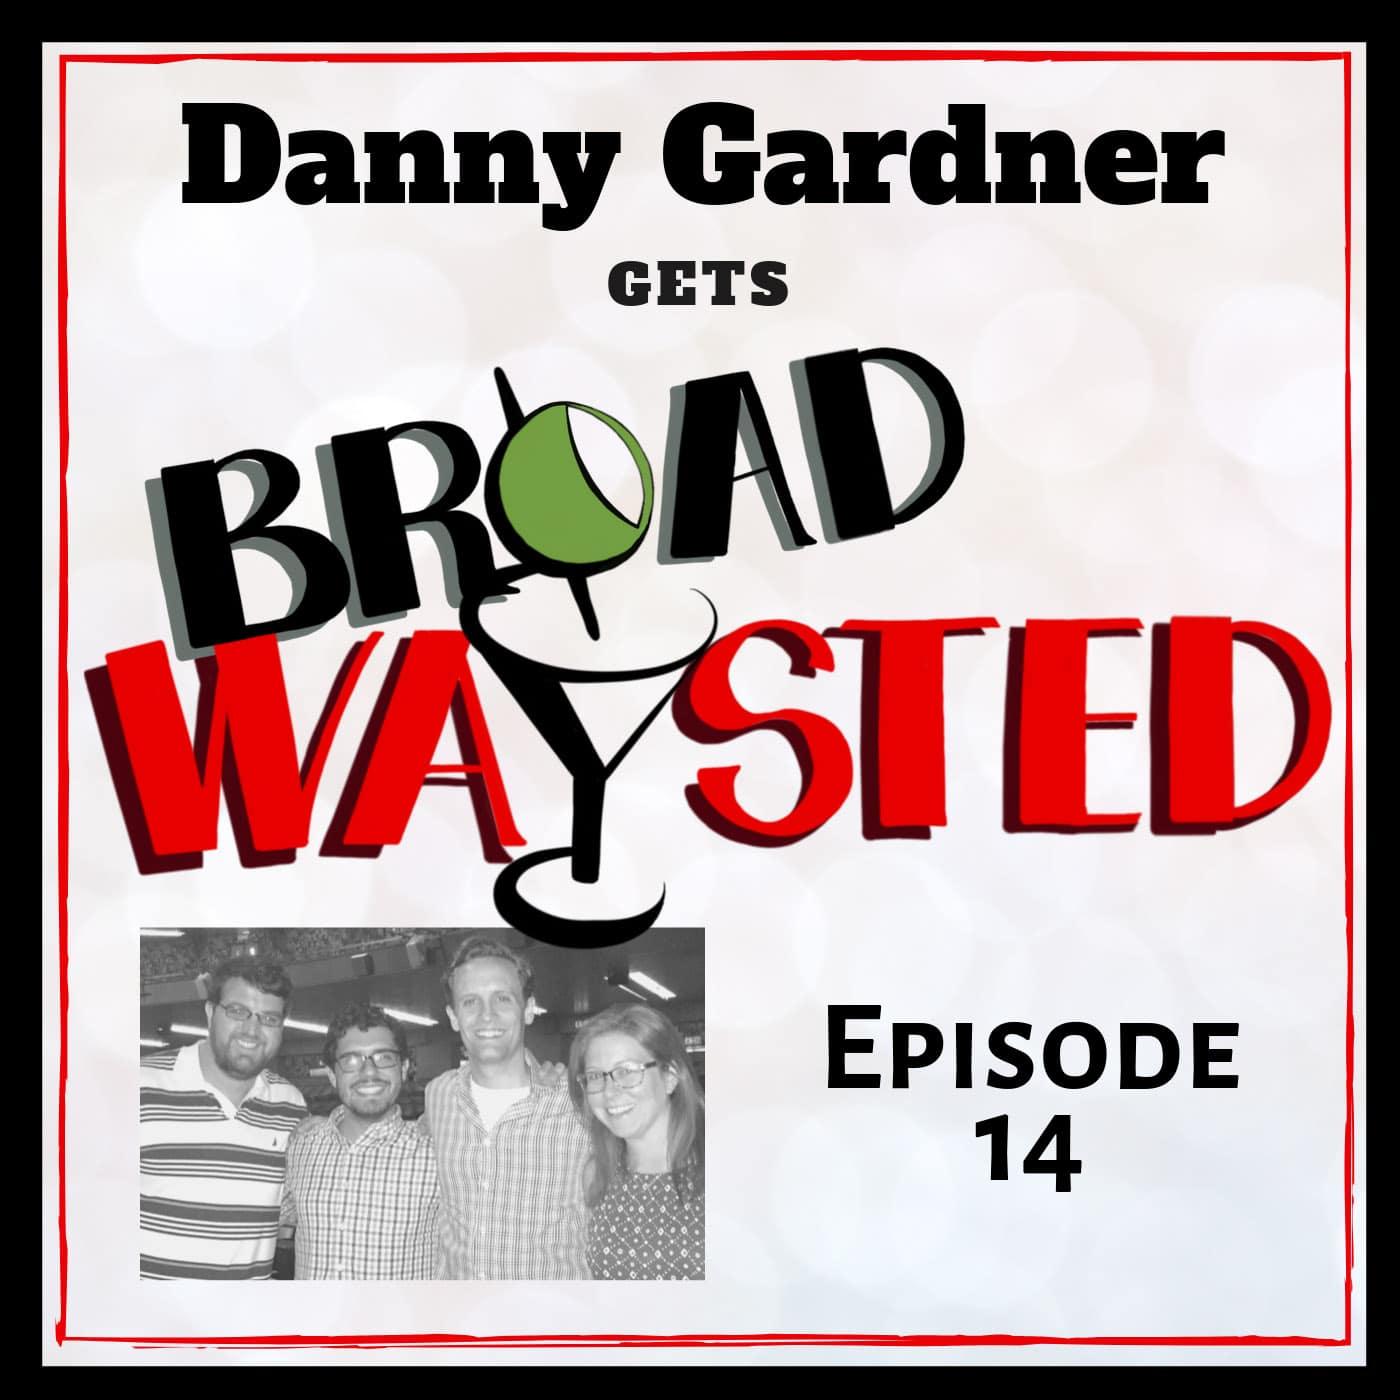 Broadwaysted Ep 14 Danny Gardner